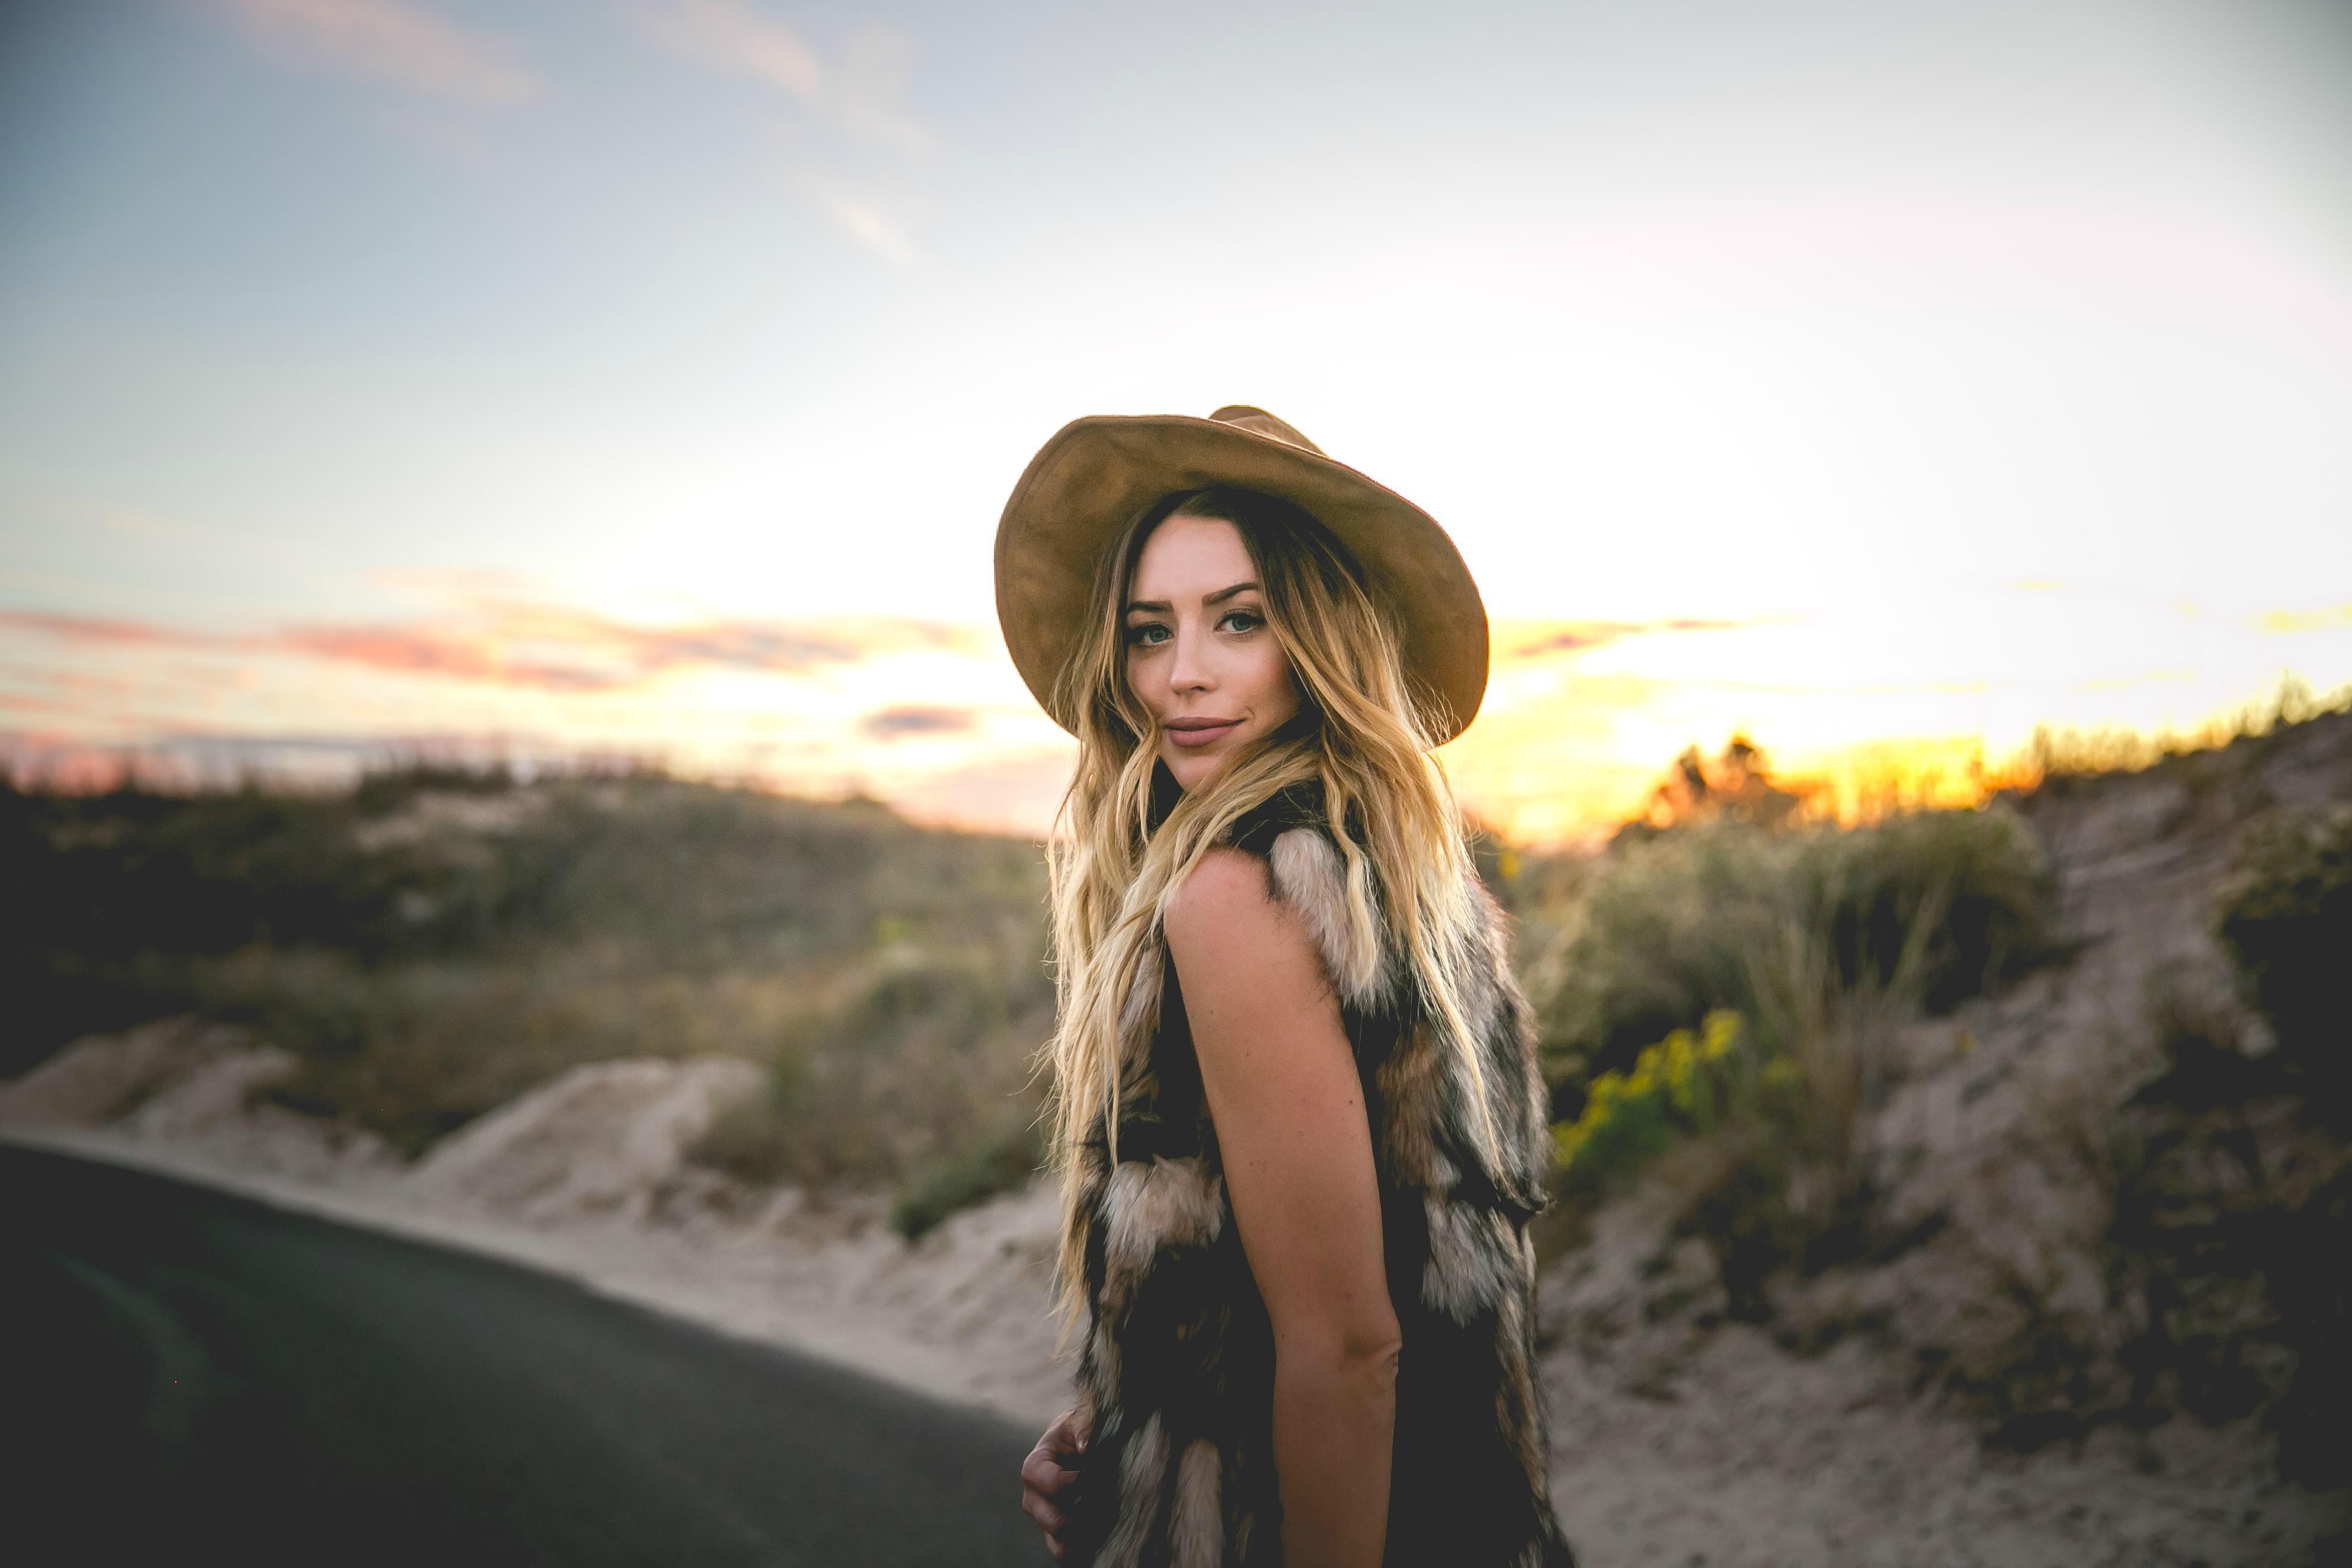 Texas Country Rising Star Kylie Rae Harris Dies In NM Accident